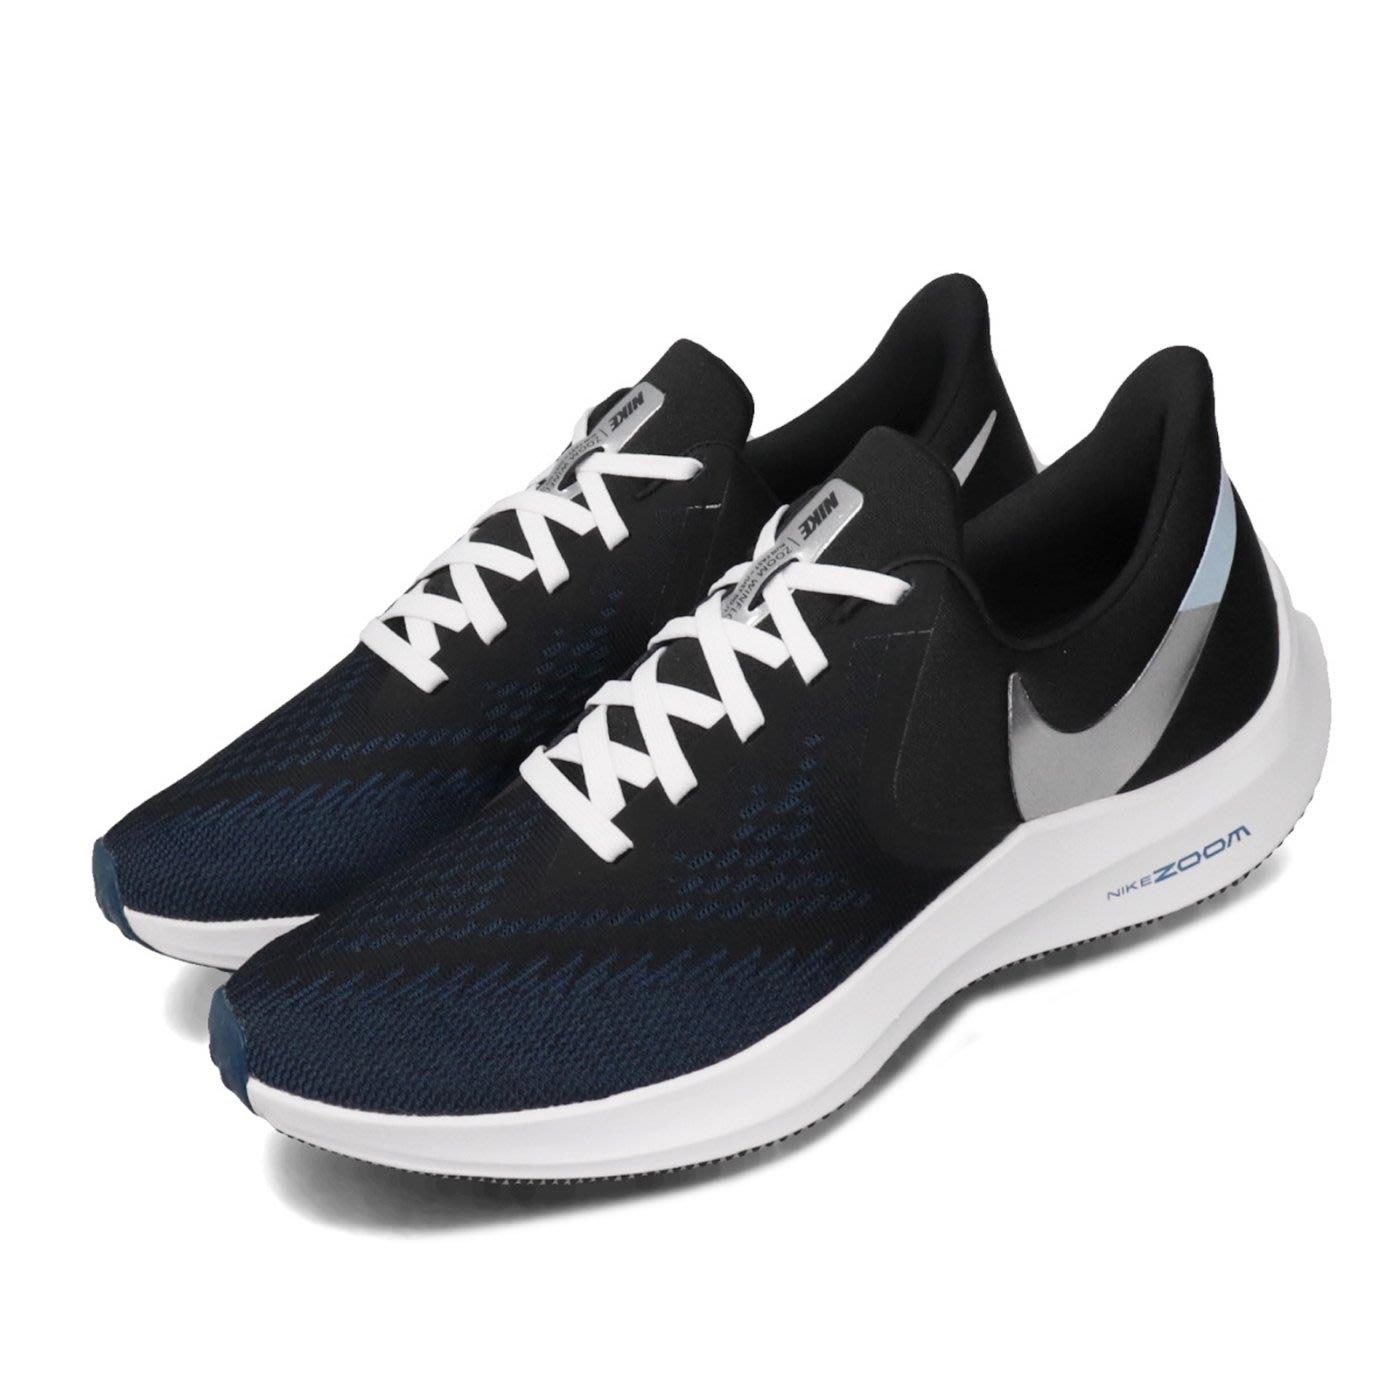 =CodE= NIKE ZOOM WINFLO 6 針織網布慢跑鞋(黑白藍銀)CU2990-001 輕量 透氣 避震 男